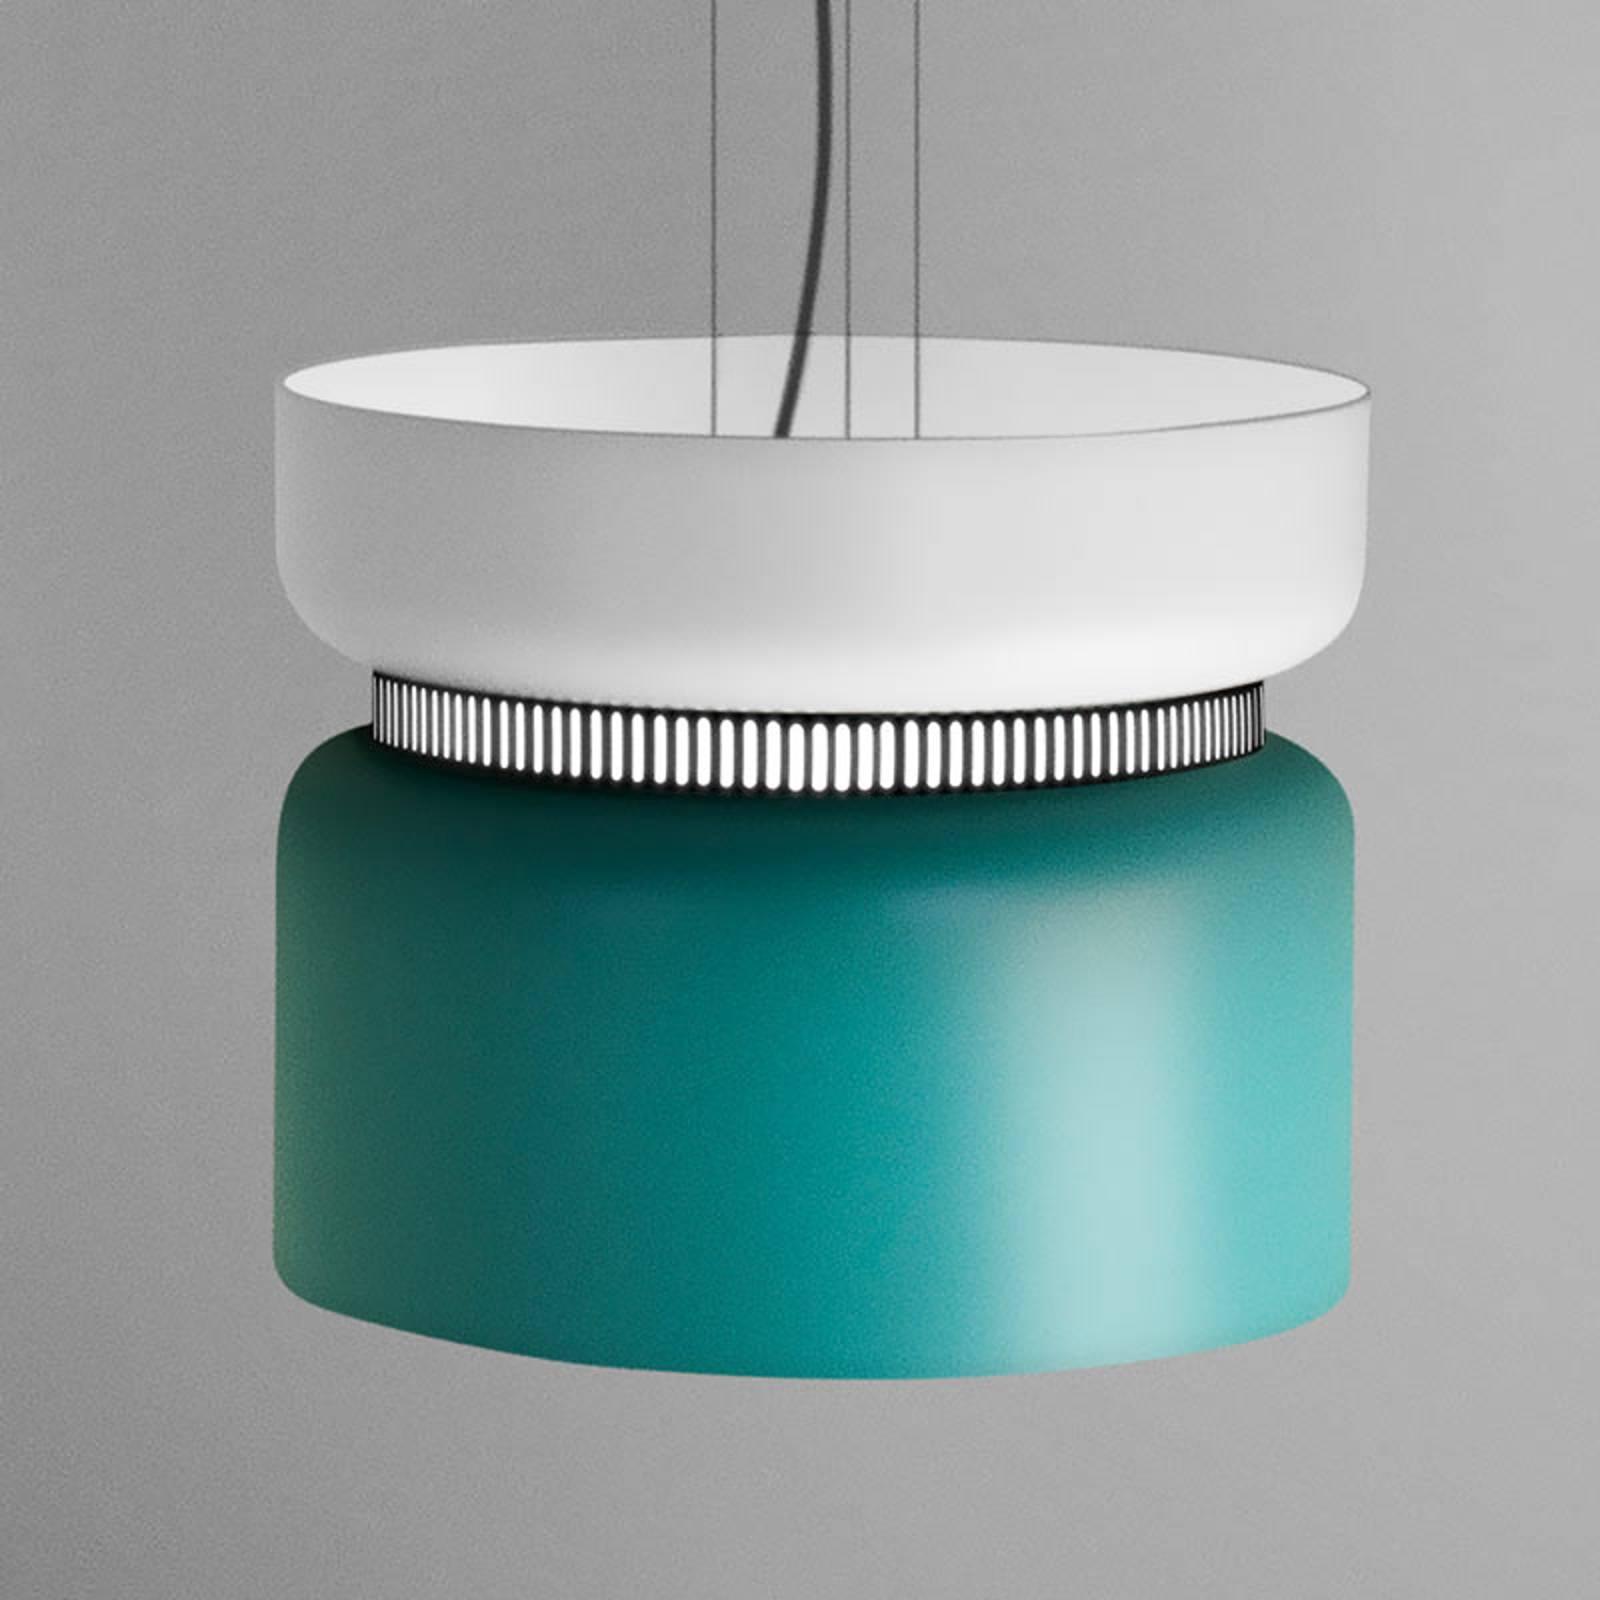 LED-Pendelleuchte Aspen S weiß-türkis 40 cm